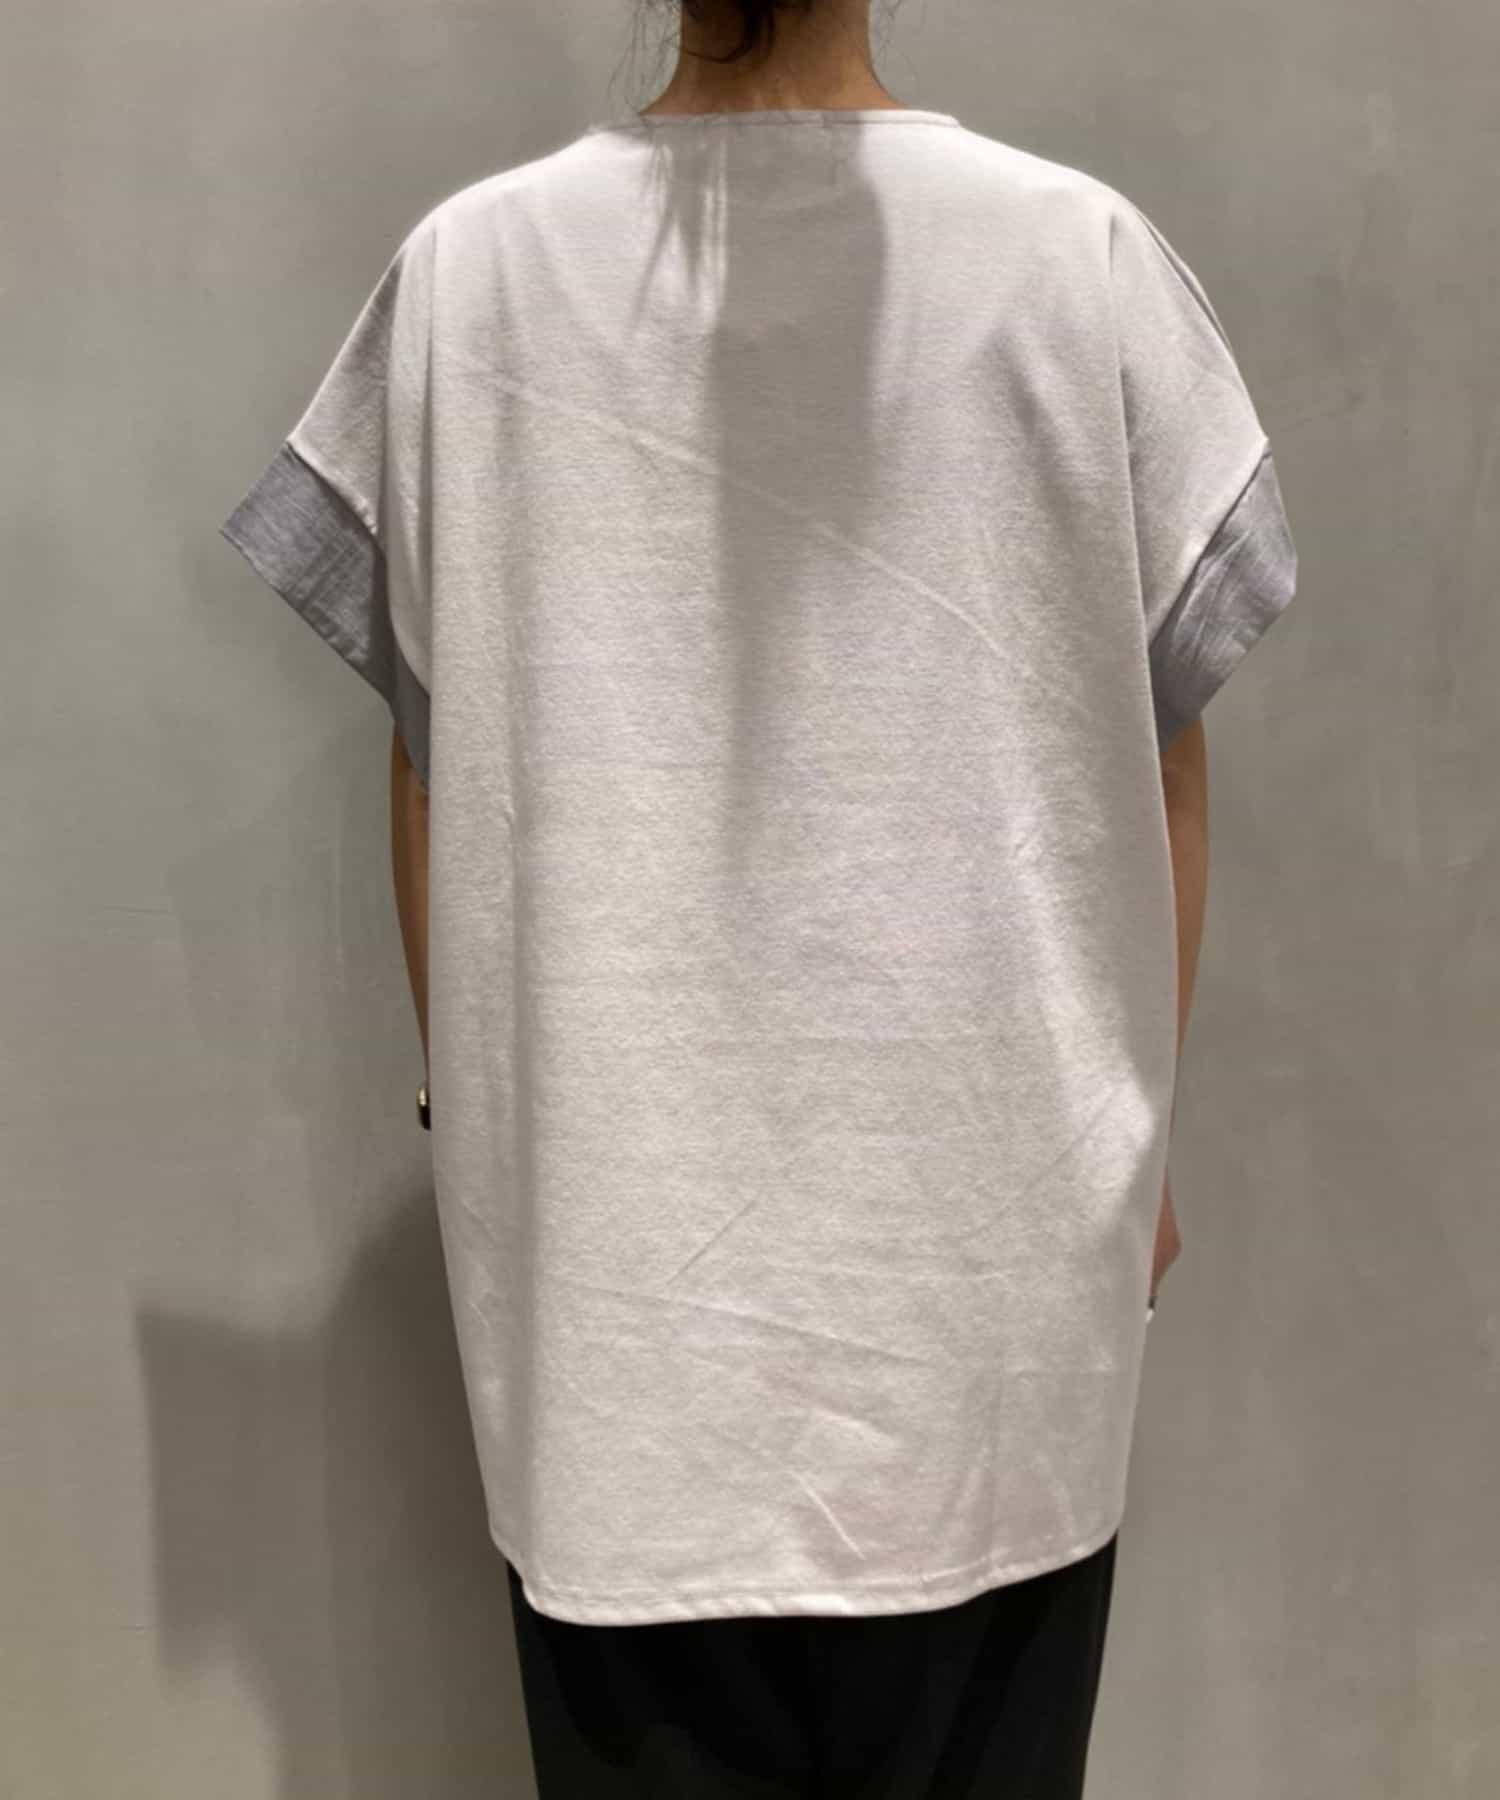 Pal collection(パルコレクション) 《Tシャツとチュニックのイイトコどり!》麻混ベルトカットソーチュニック